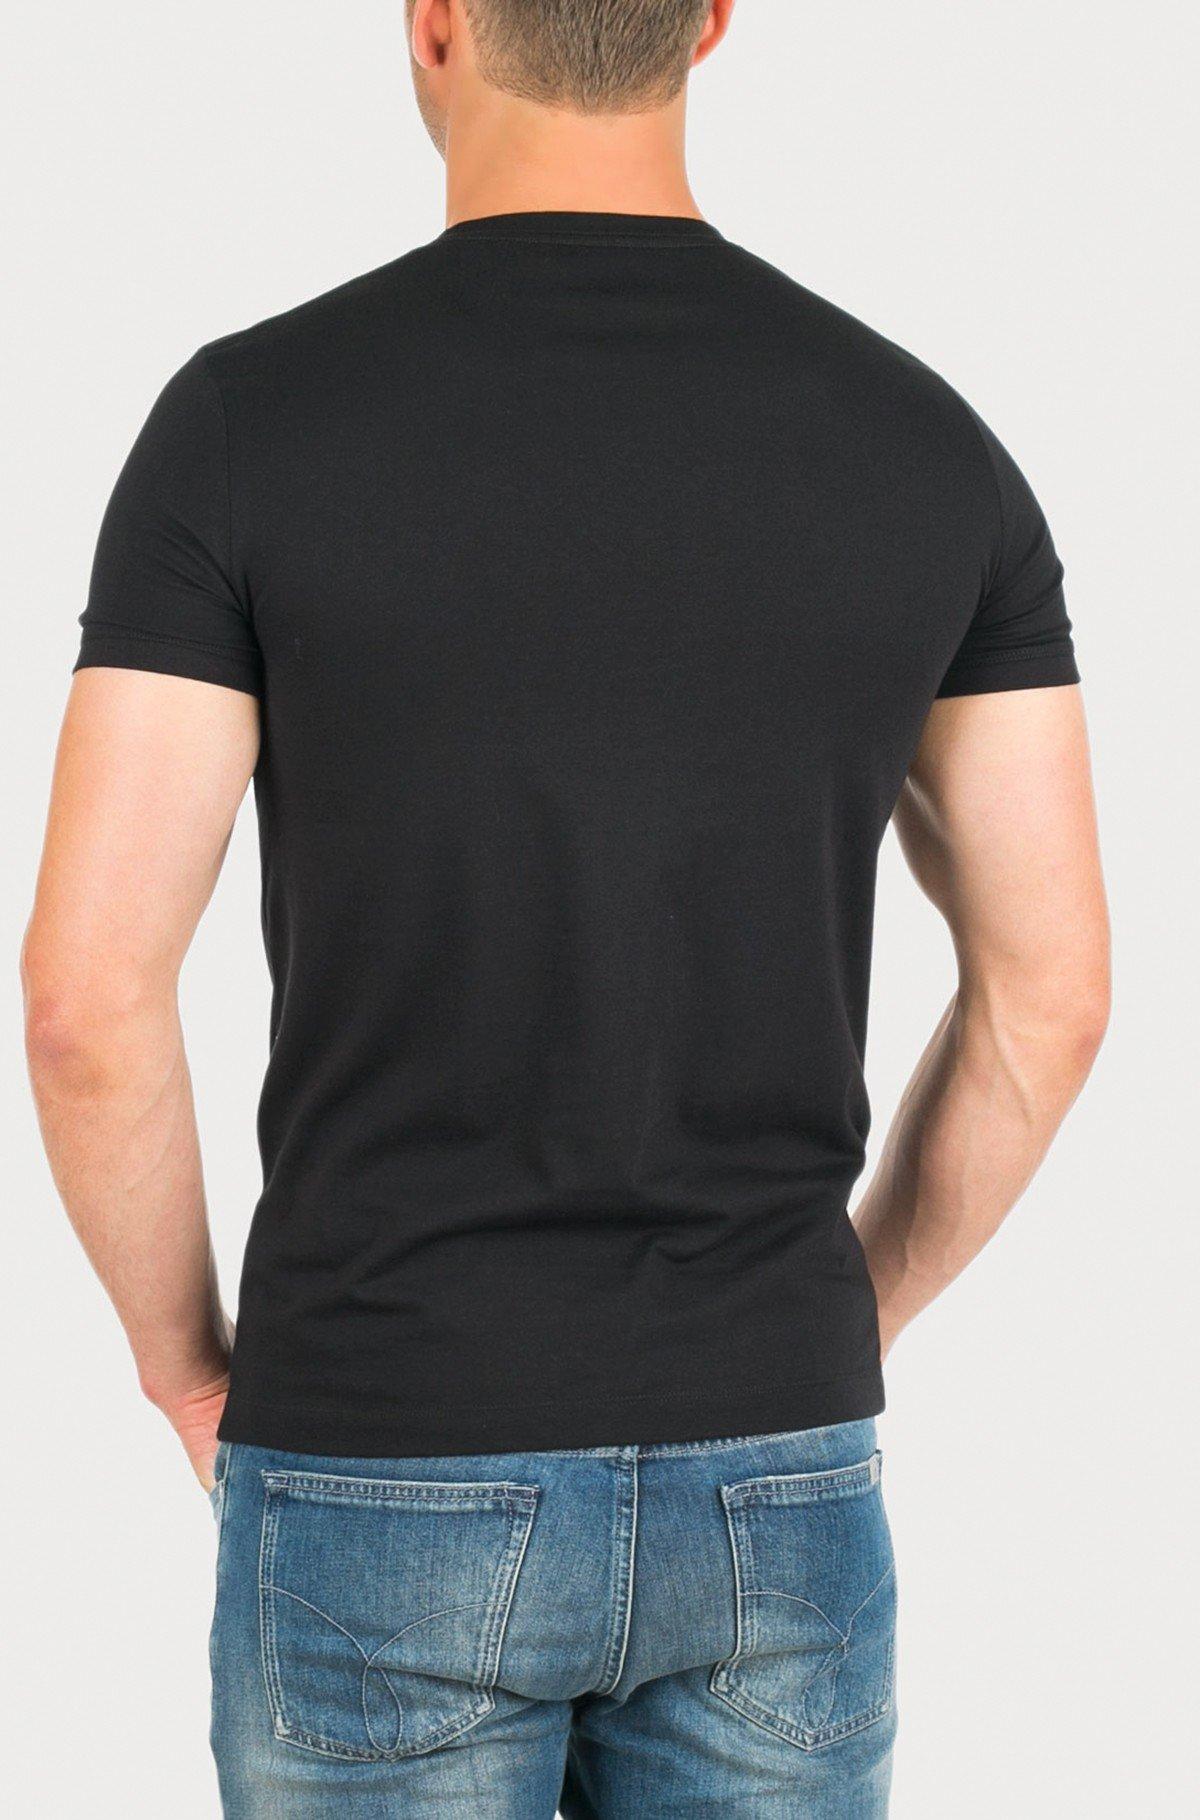 T-shirt Charing-full-2